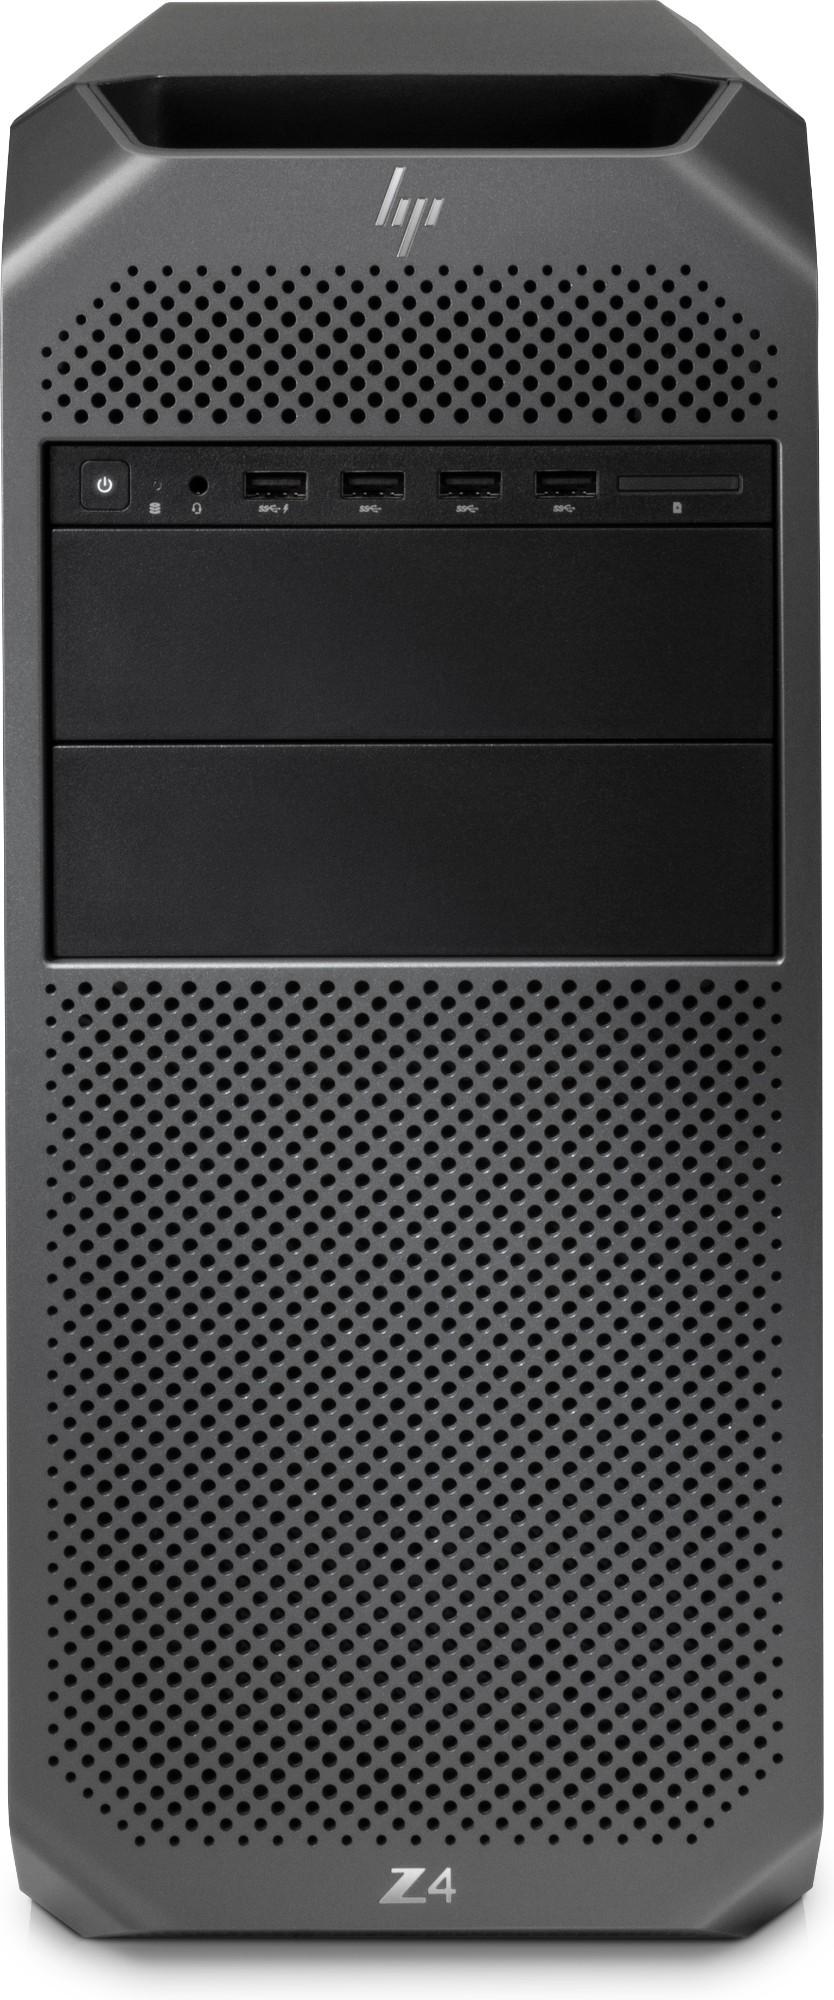 Workstation Z4 G4 Tower - W2123 - 16GB RAM - 1TB HDD - Win10 Pro